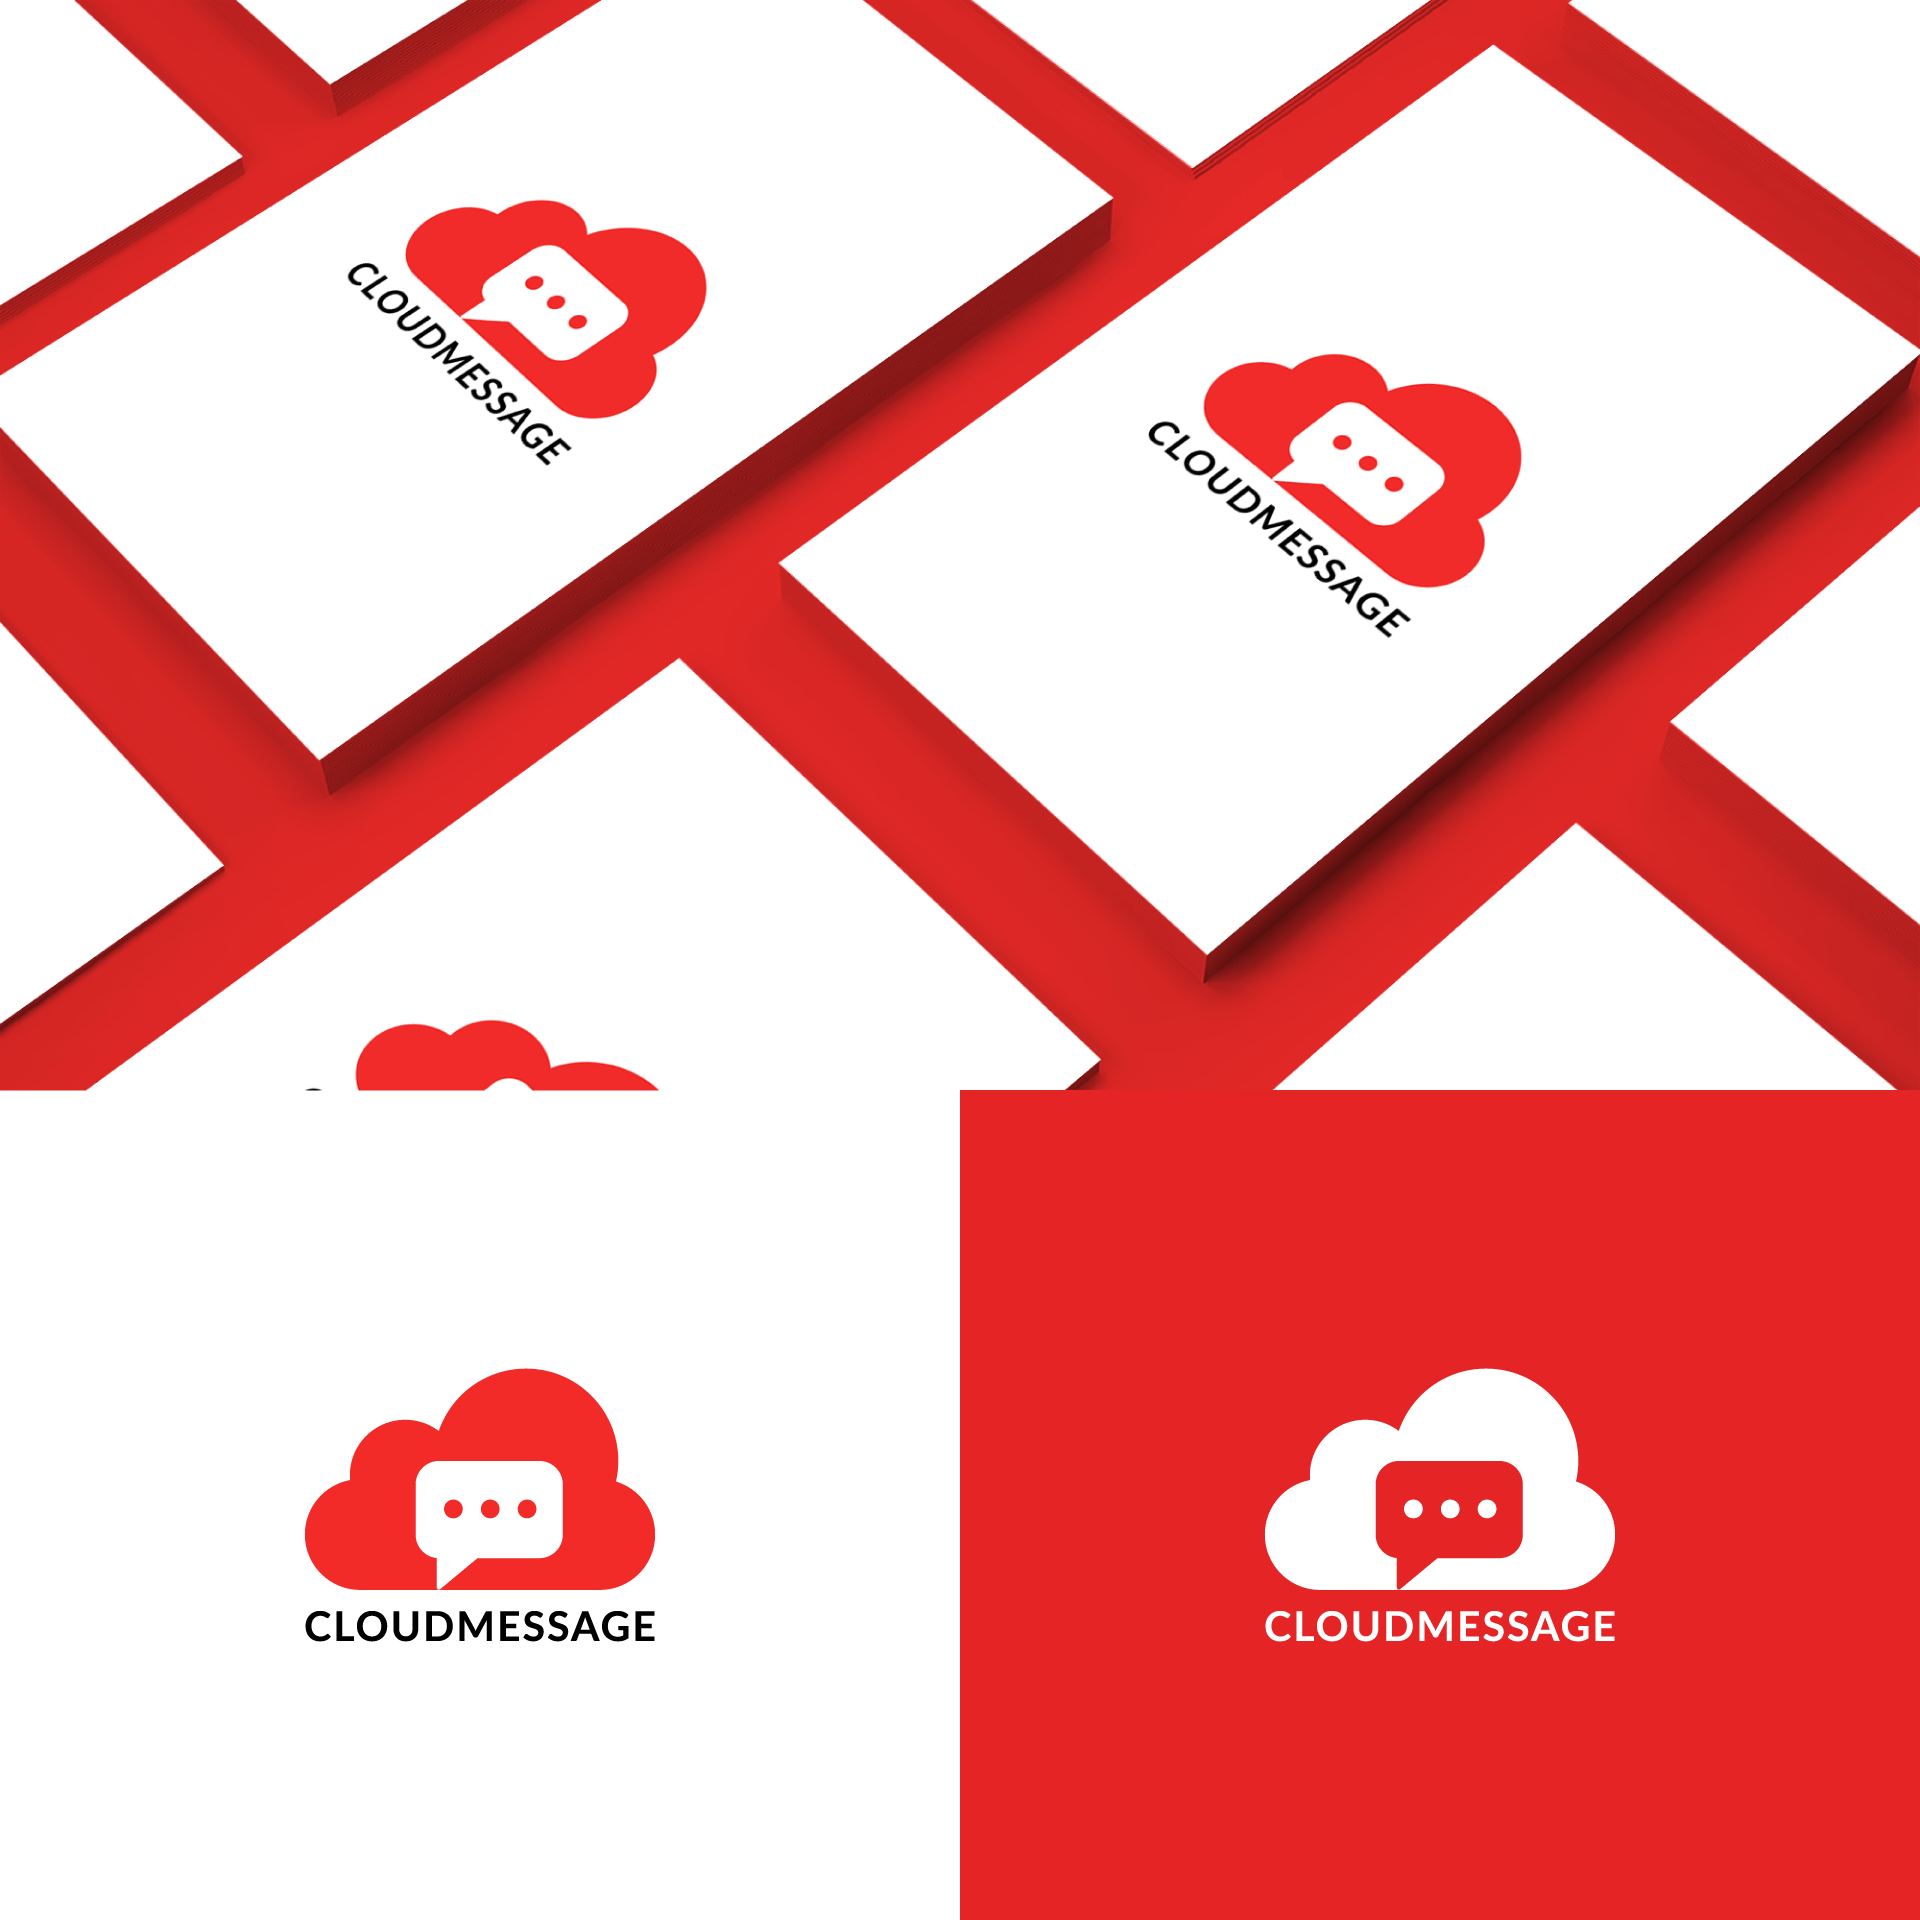 cloudmessage-square-01.png